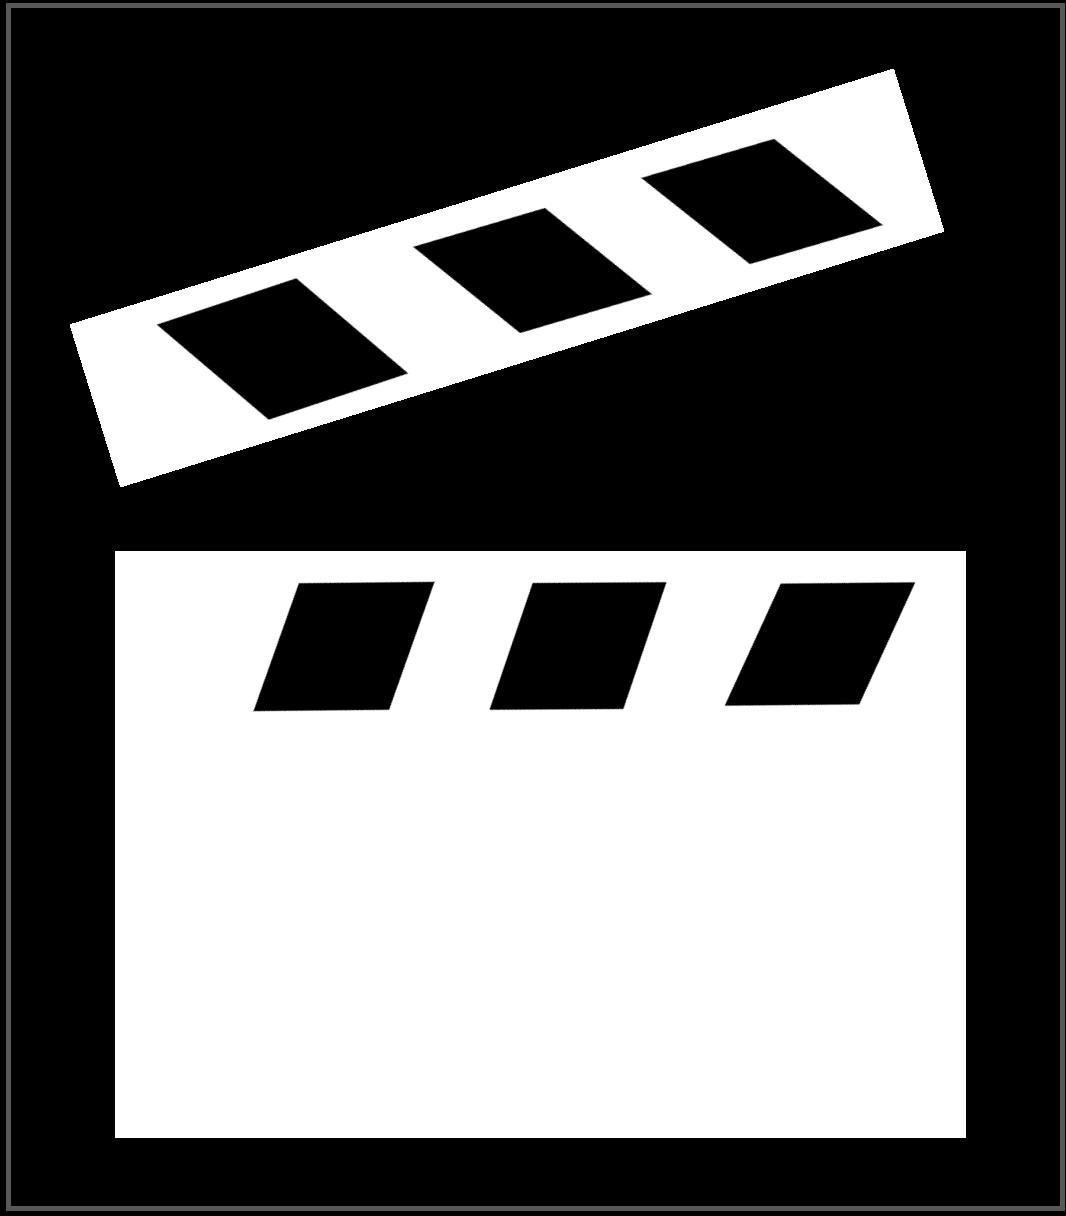 White film slate